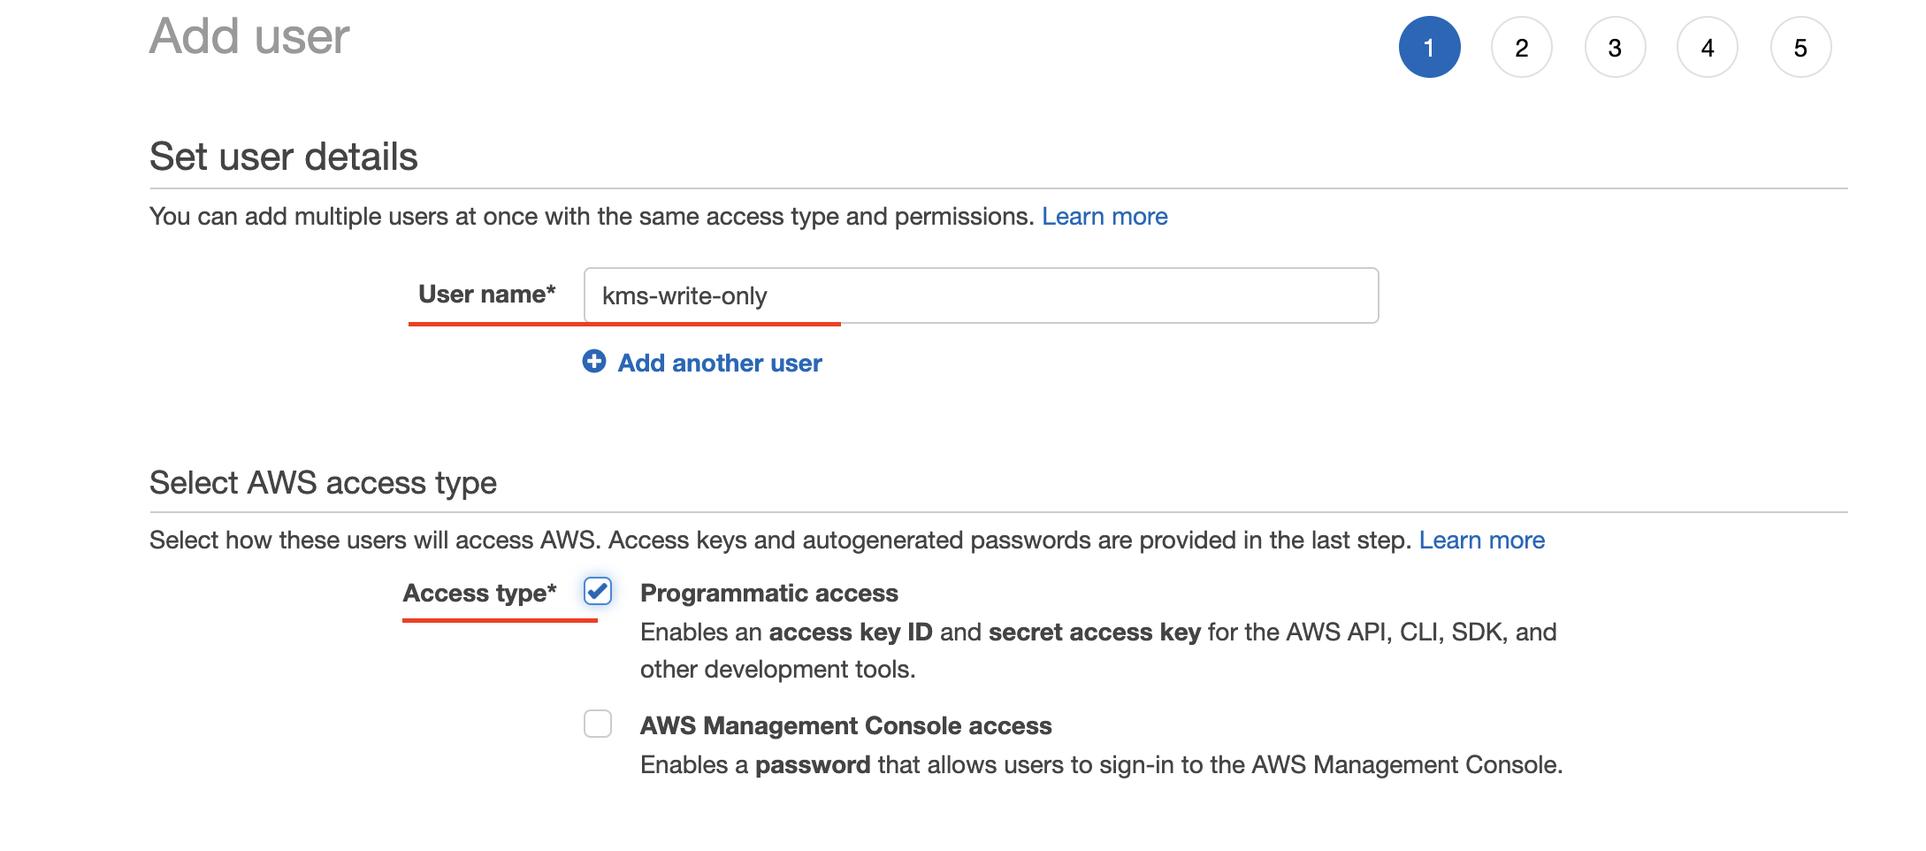 Access type